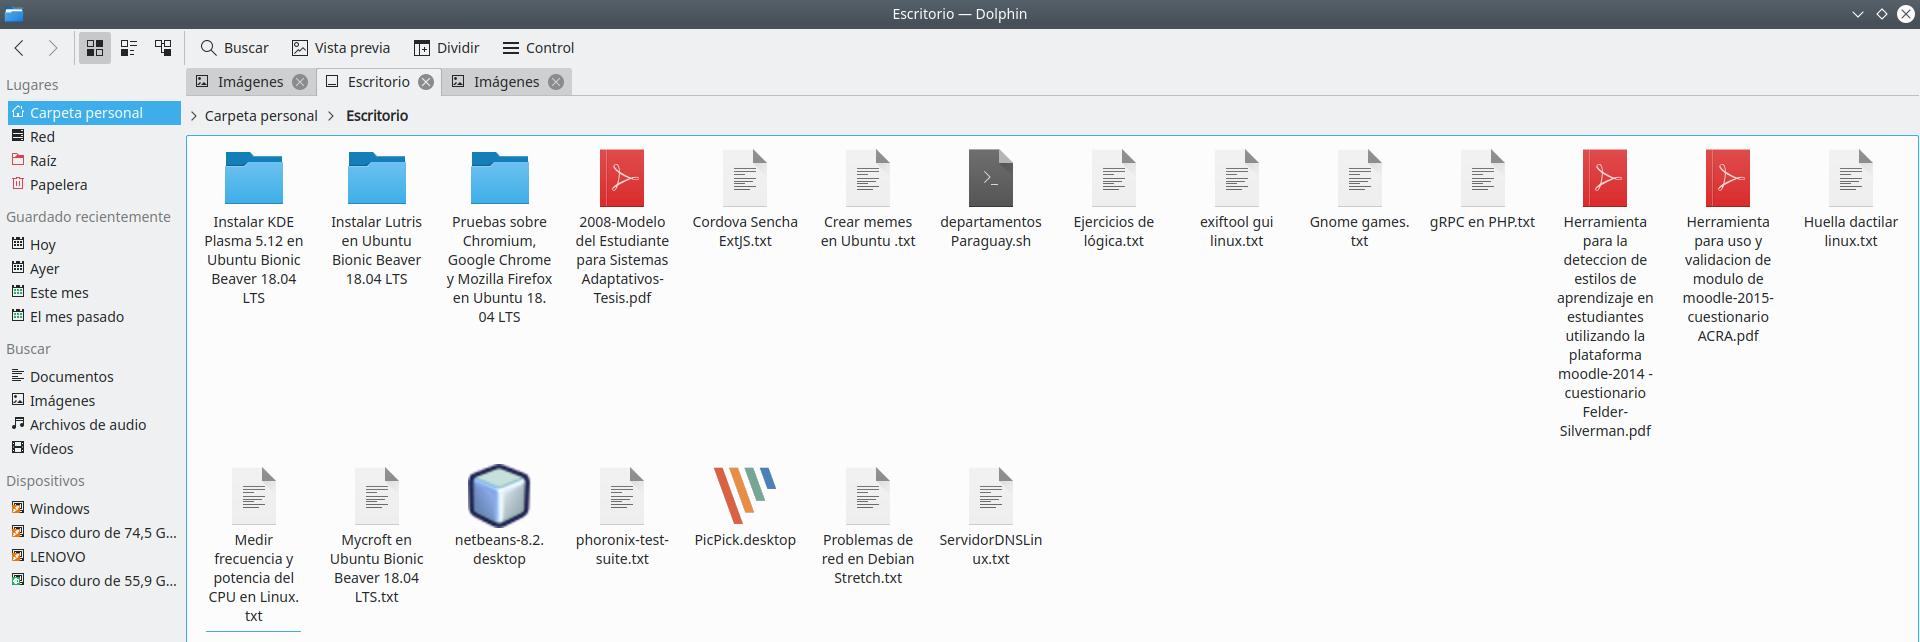 KDE Plasma 5.12.6 en Ubuntu Bionic Beaver 18.04 LTS